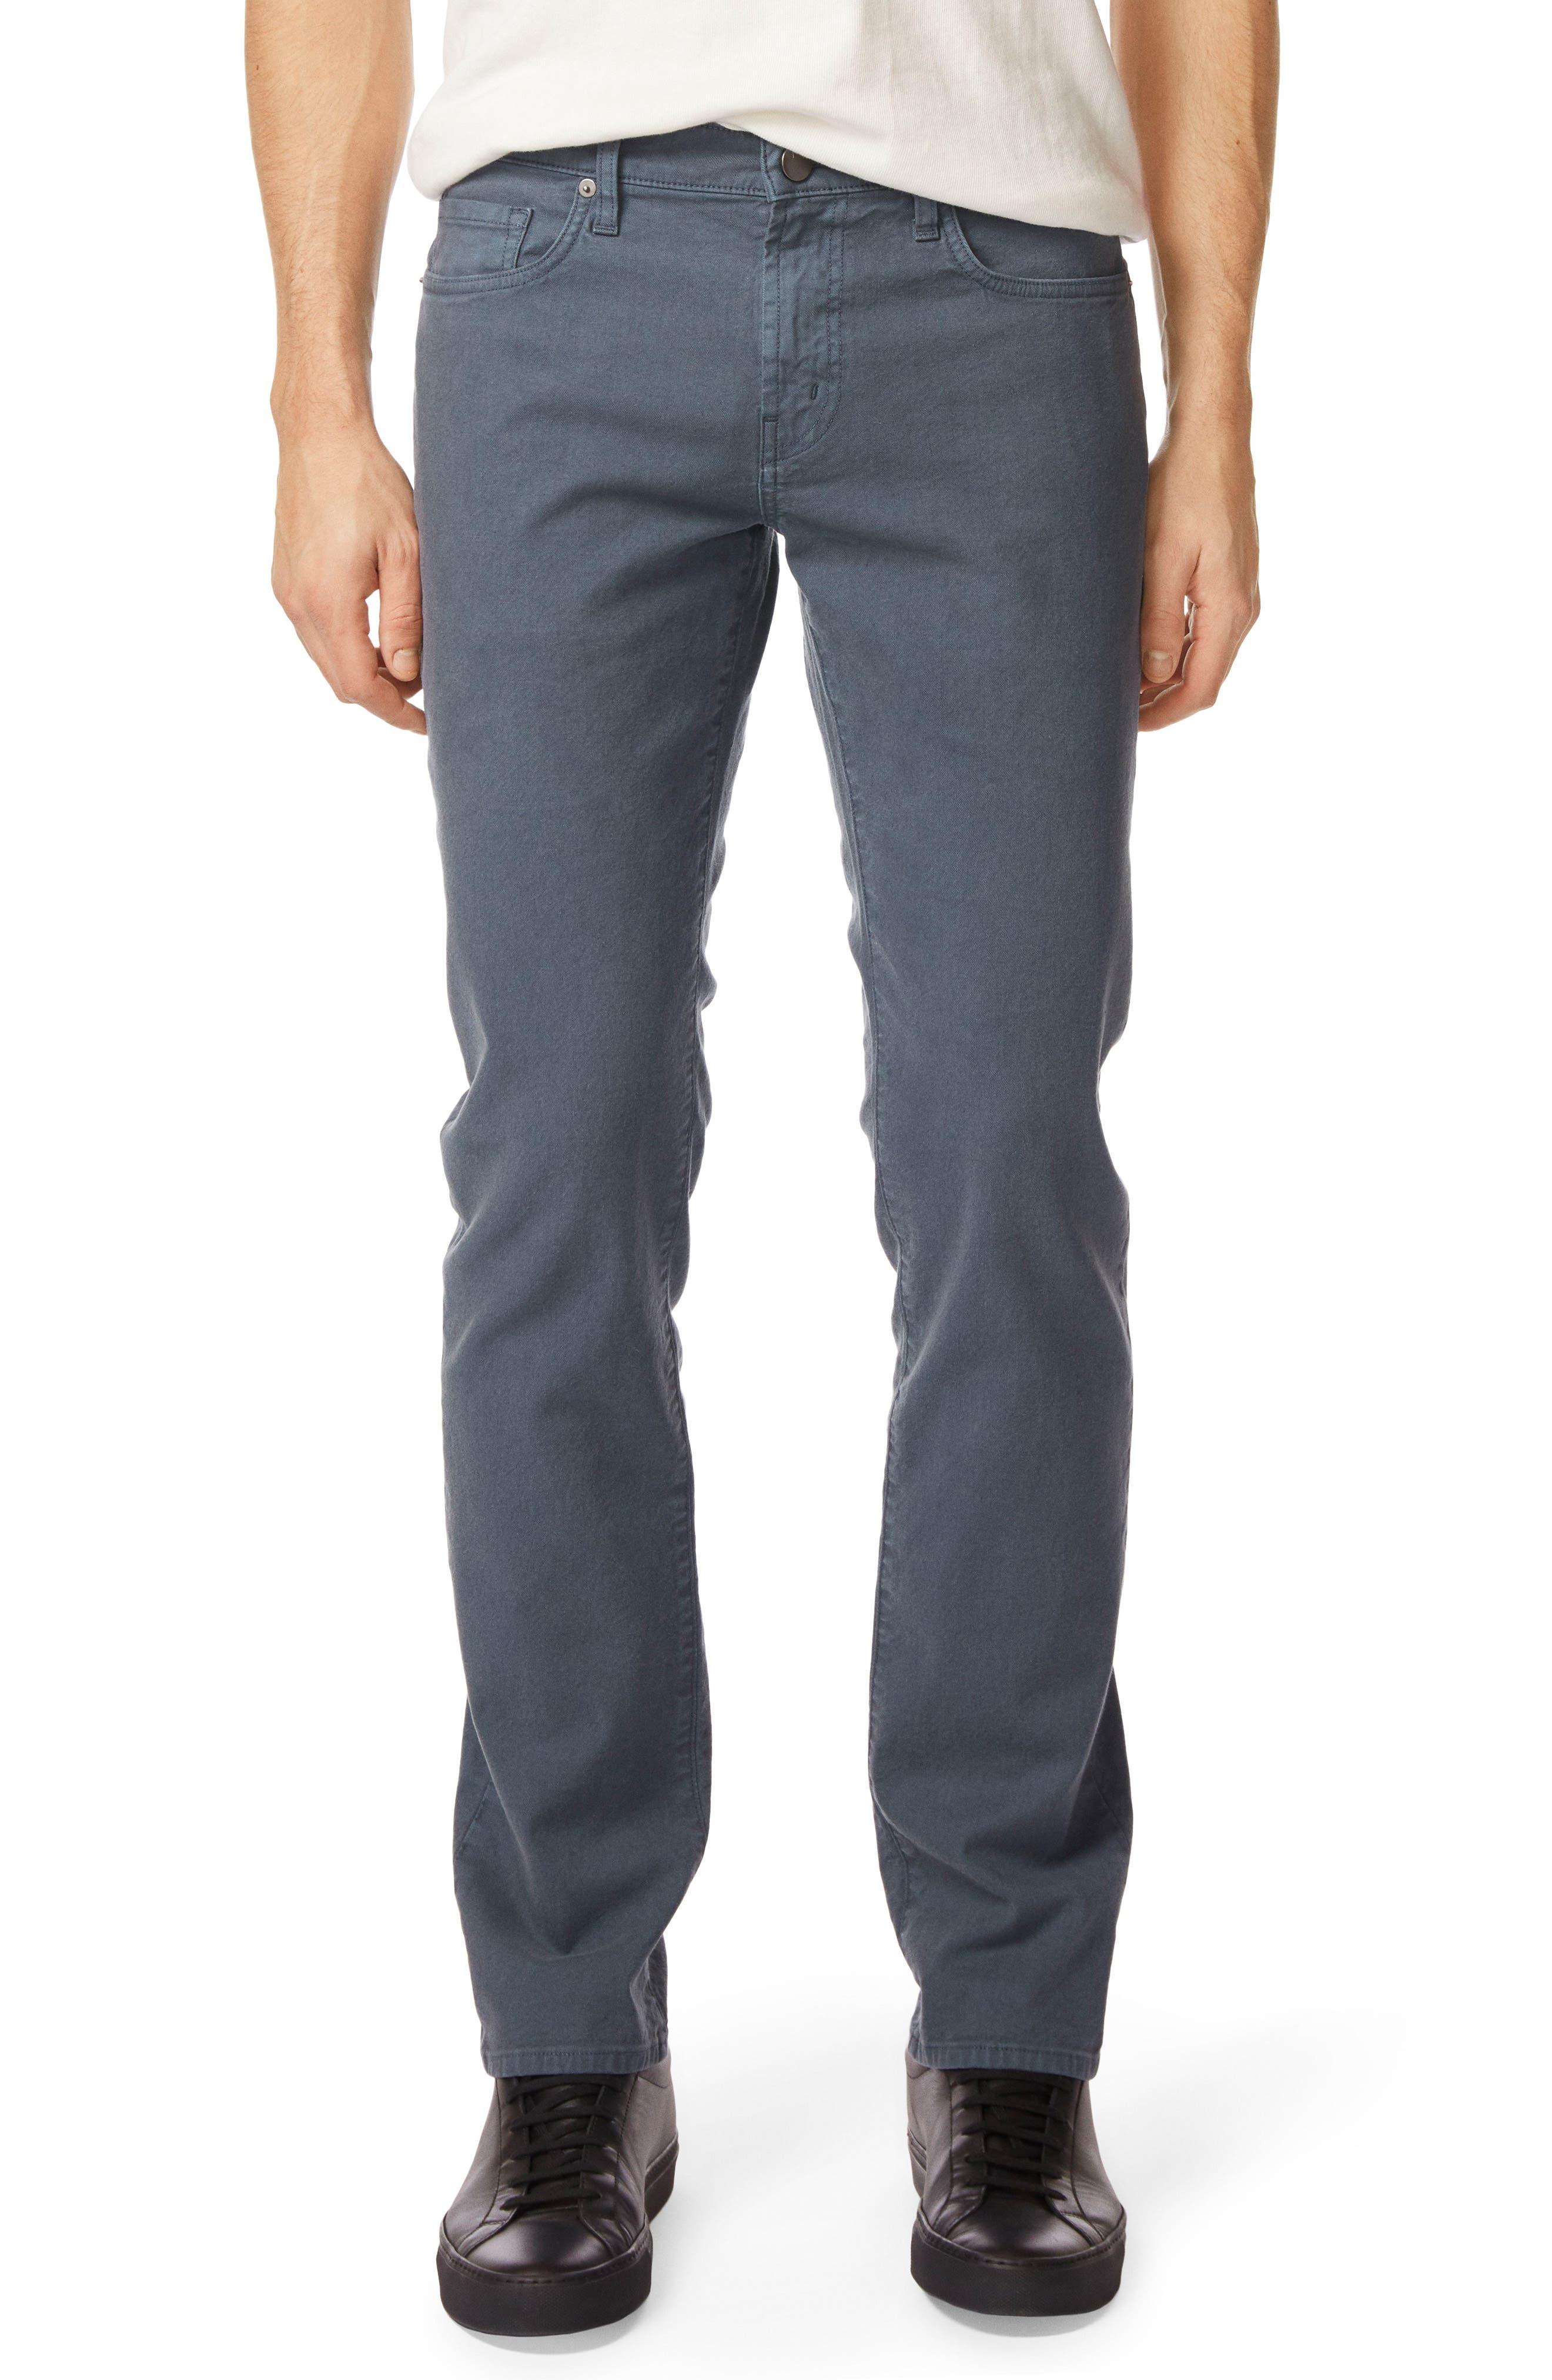 Kane Straight Fit Pant,                         Main,                         color, Tilite